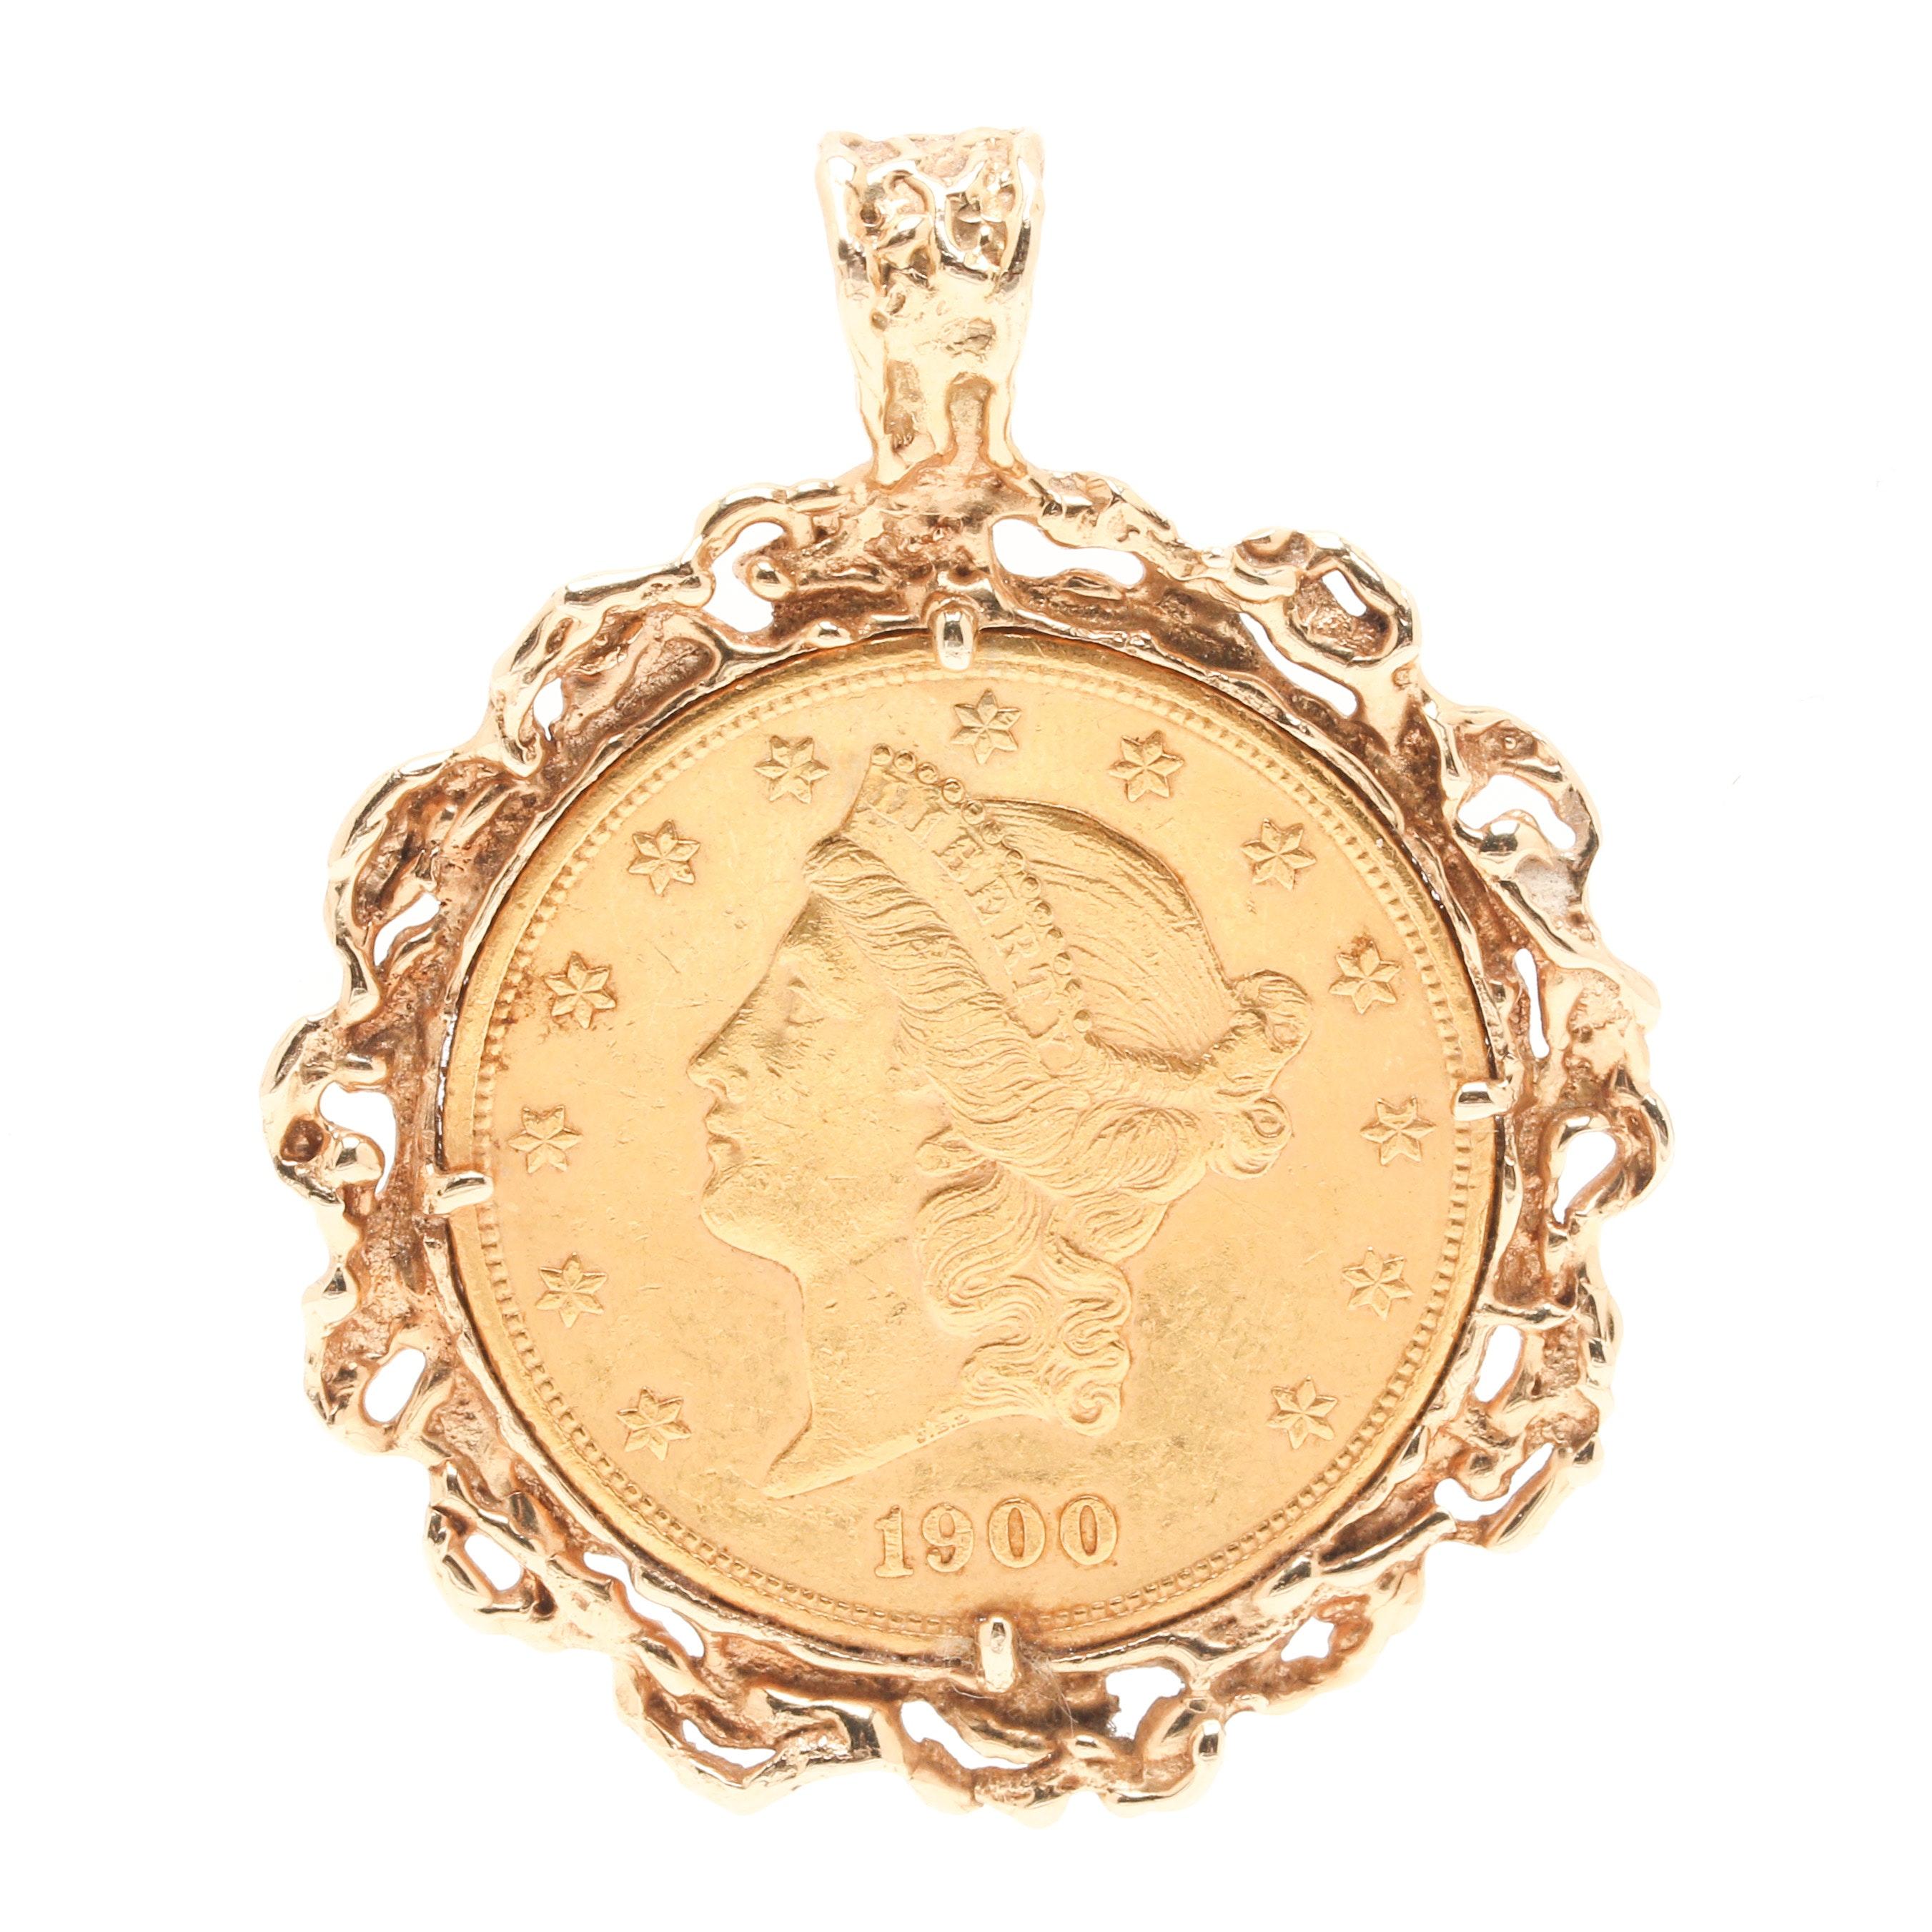 1900 James Barton Longacre 14K and 22K Yellow Gold Liberty Head $20 Coin Pendant